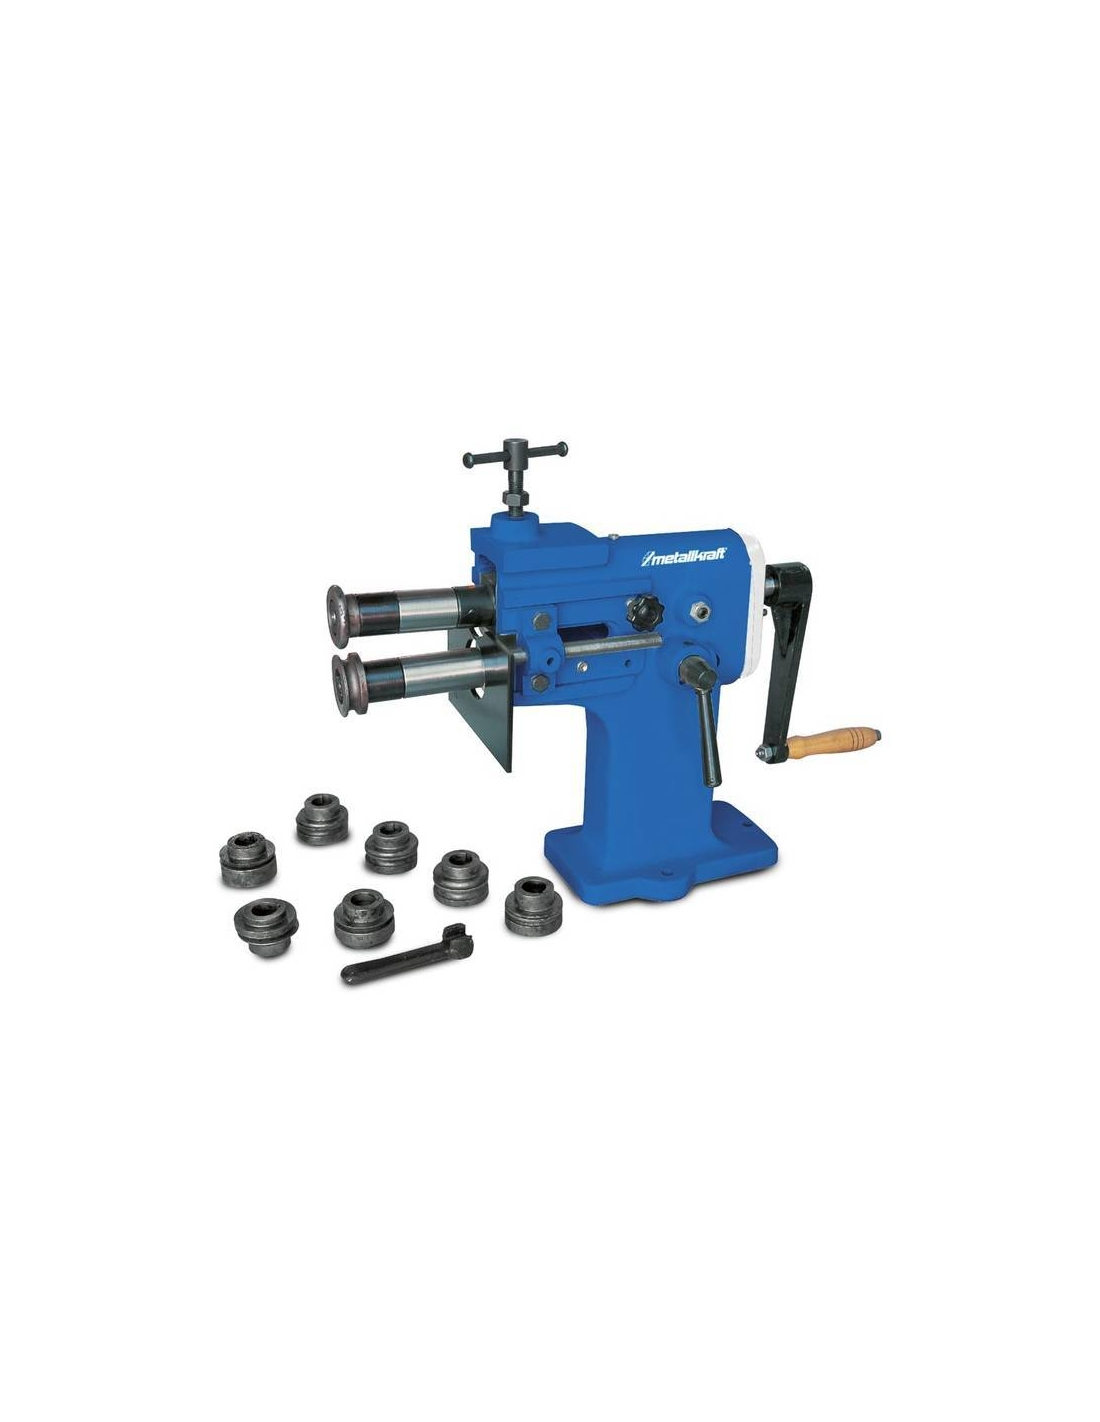 Masina de zencuit manuala Metallkraft SBM 140-12